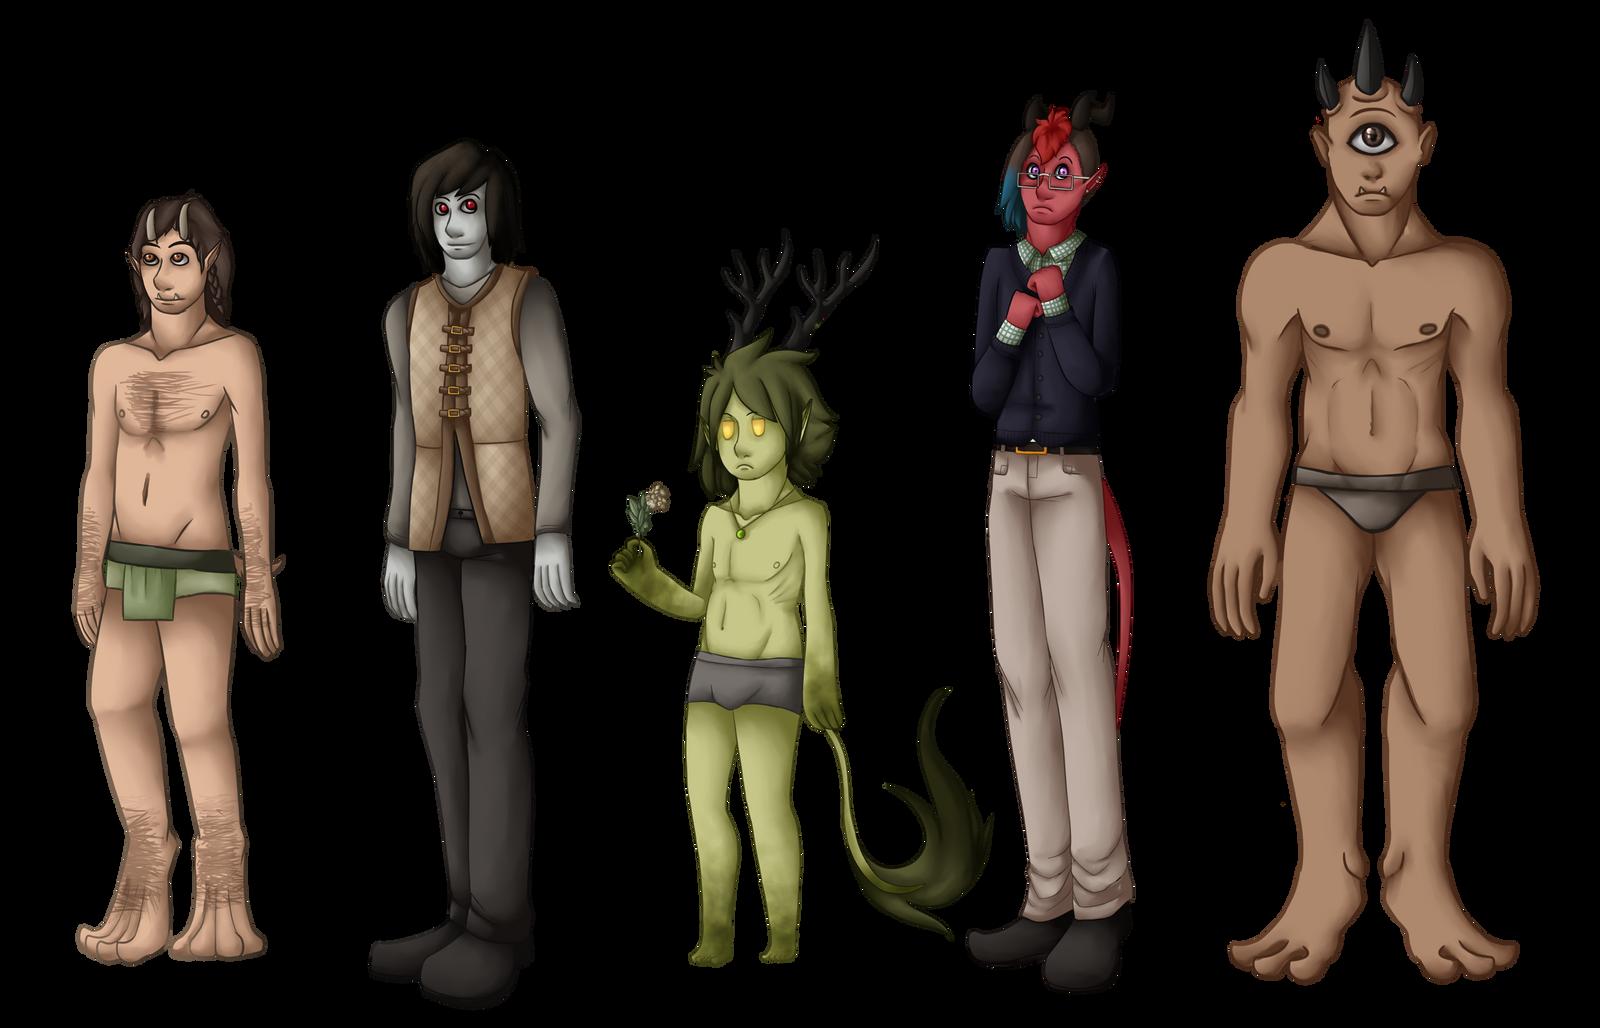 The new monster boys by ElithianFox